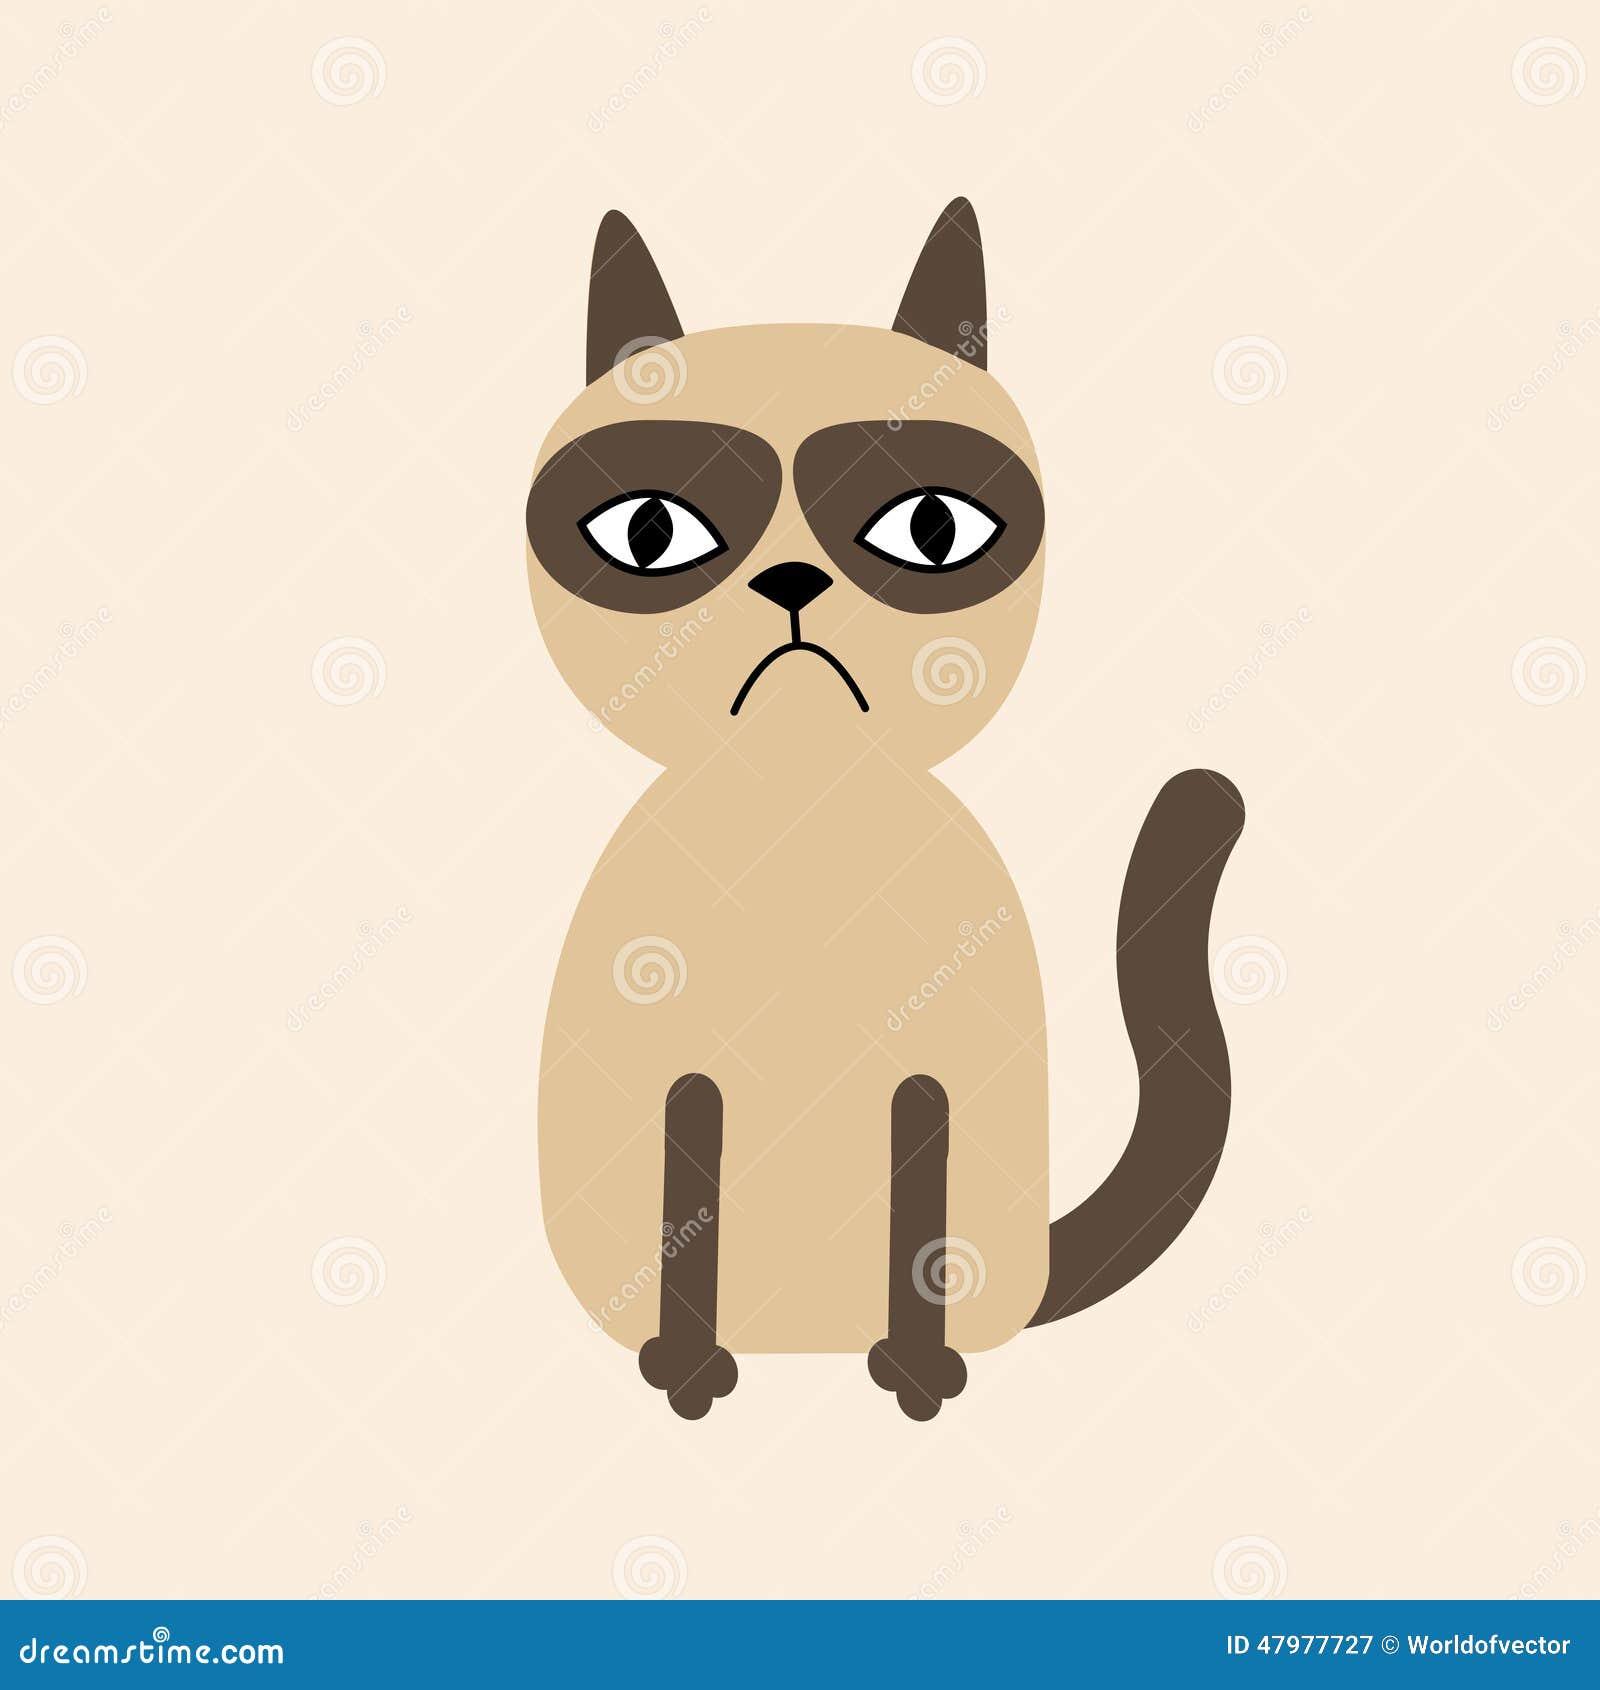 Cute Sad Grumpy Siamese Cat In Flat Design Style. Stock ...